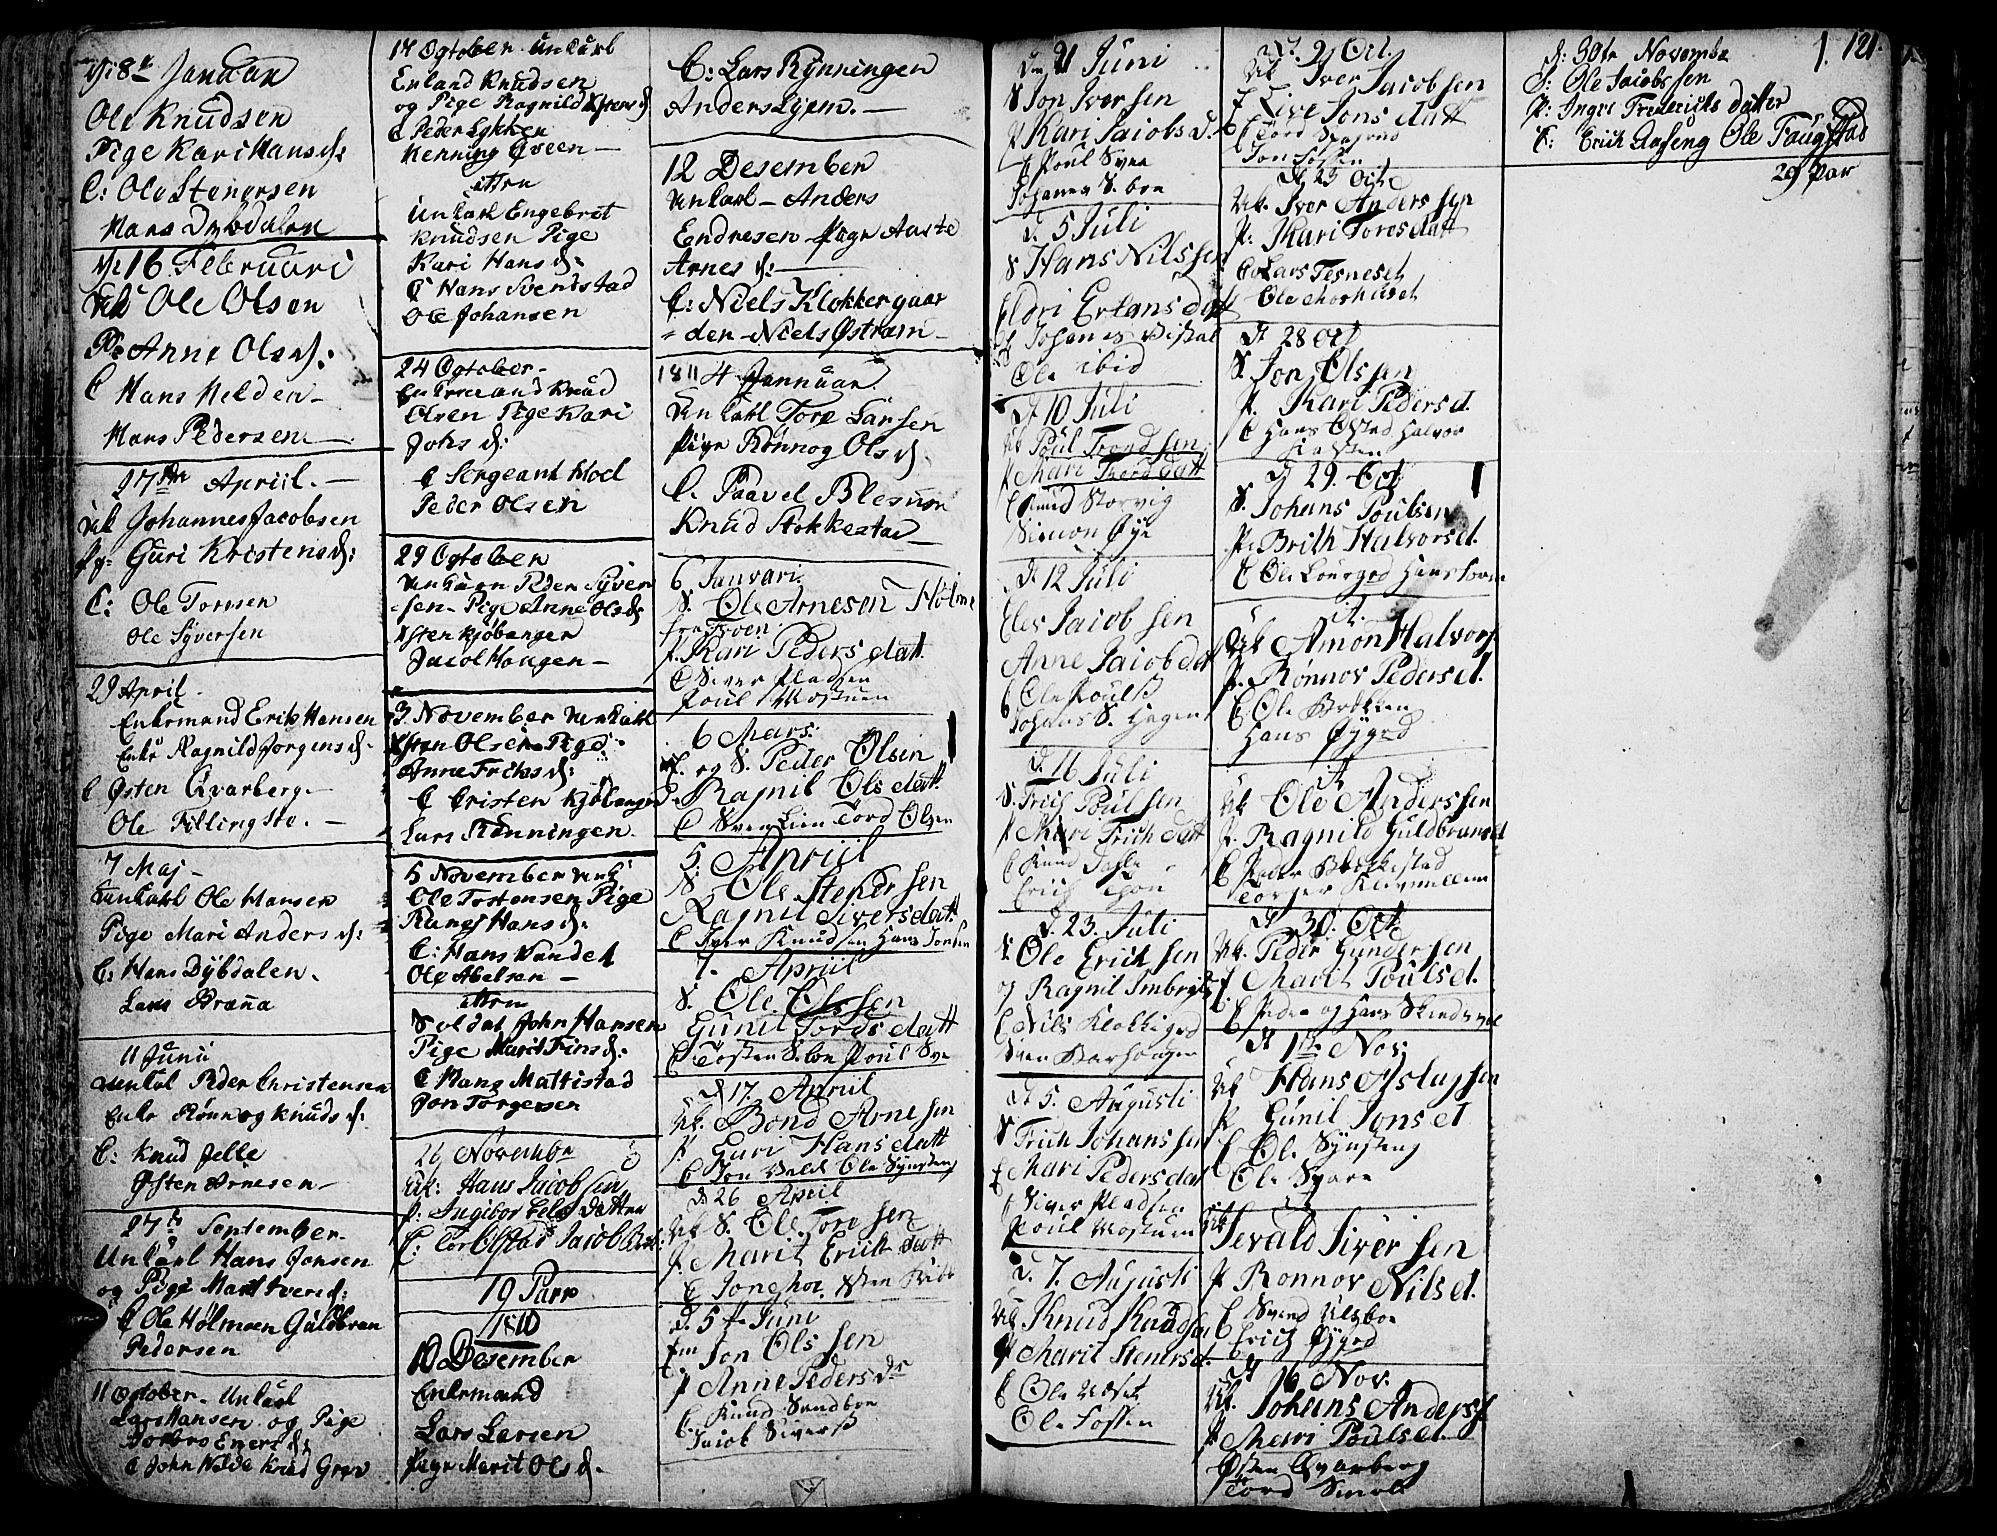 SAH, Vågå prestekontor, Ministerialbok nr. 1, 1739-1810, s. 121